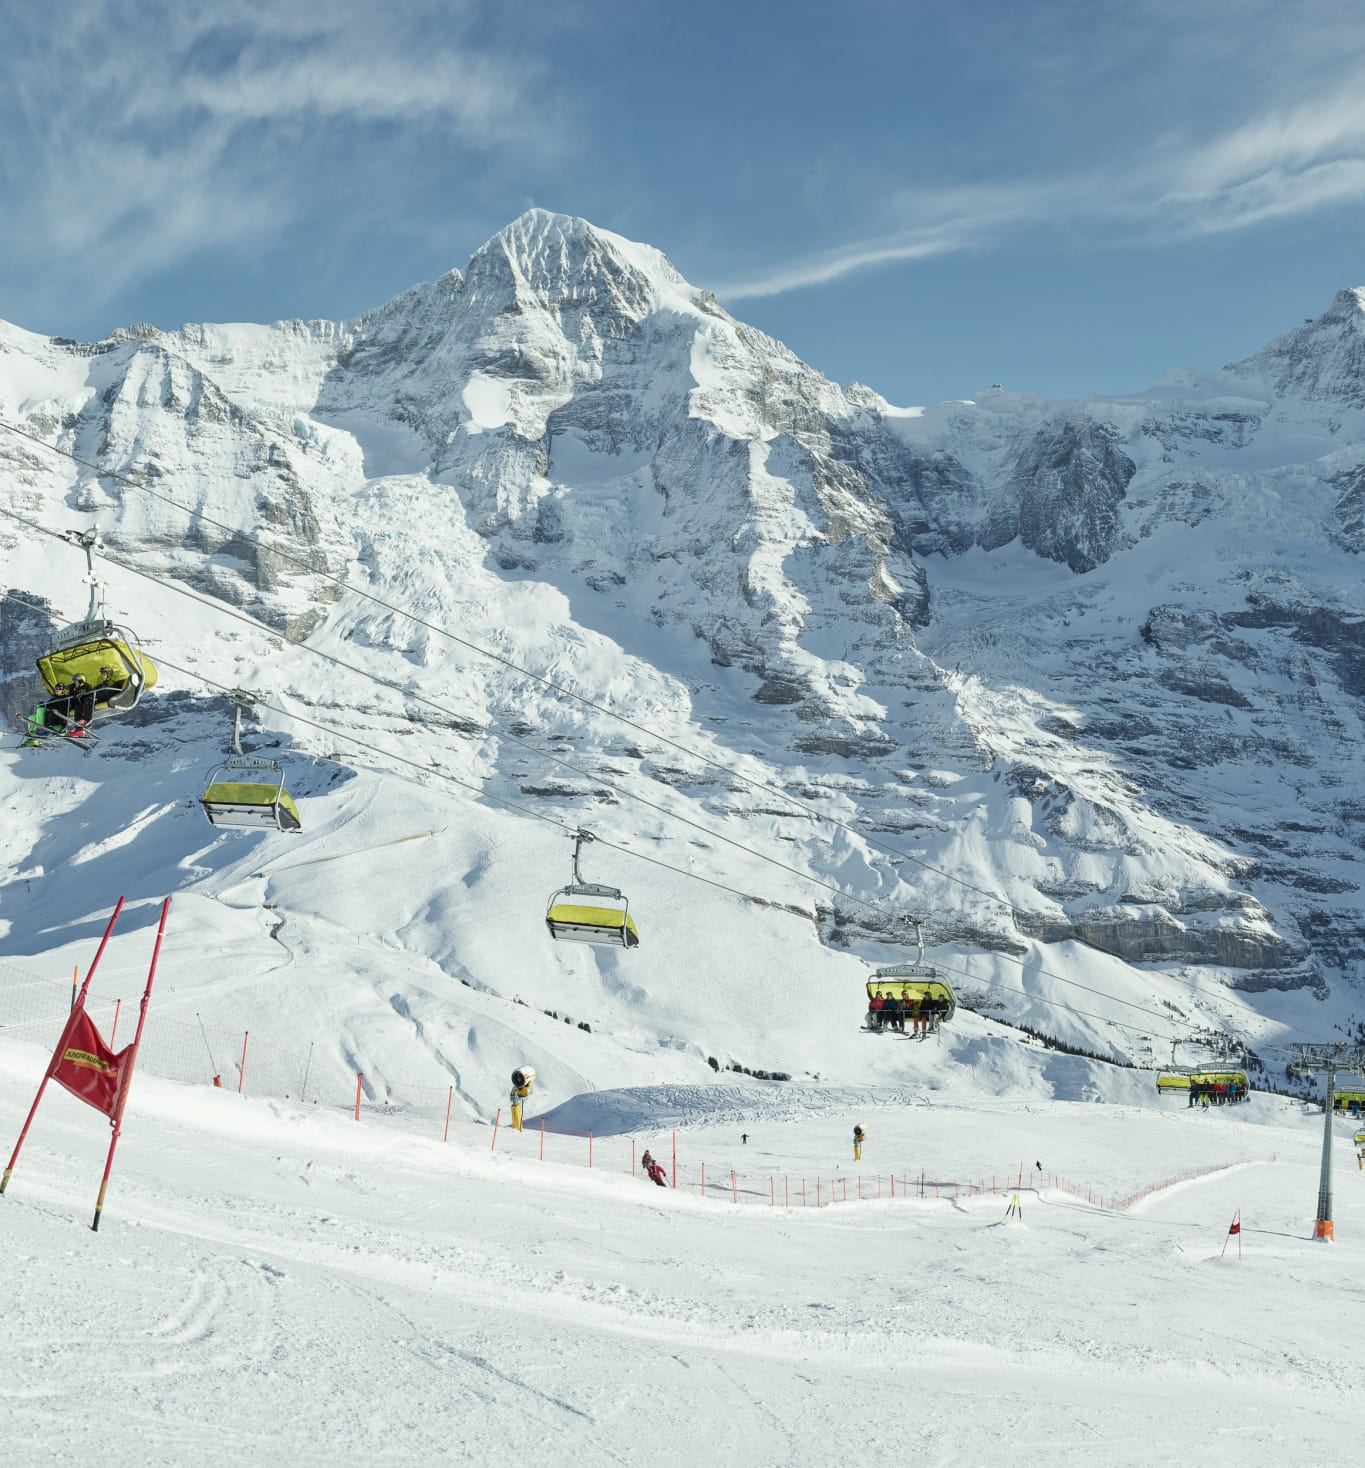 Erlebnisse-Aktivitaeten, Jungfrau-Ski-Region, Lauberhnorn-Live, Ski, Skigebiet-Grindelwald-Wengen, Winter